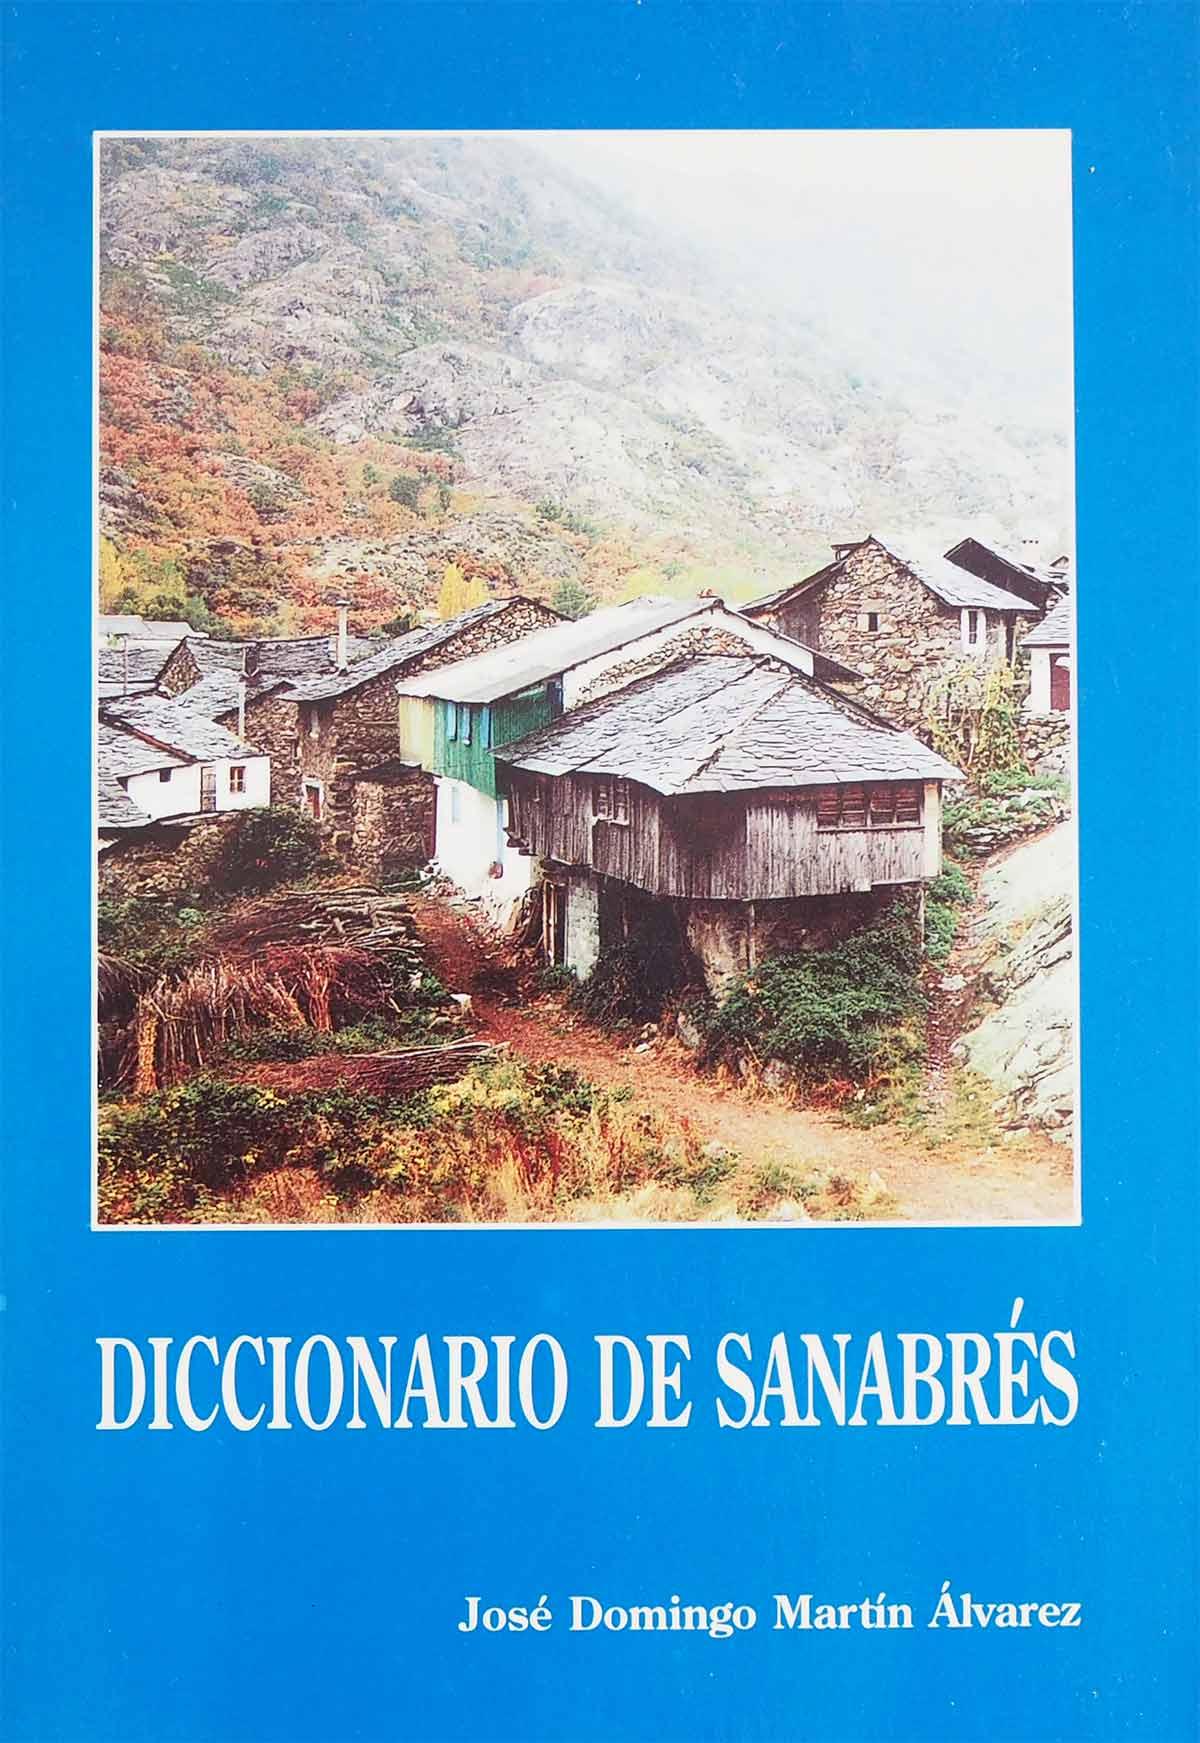 diccionario-sanabres-editorial-semuret-jose-domingo-martin-alvarez